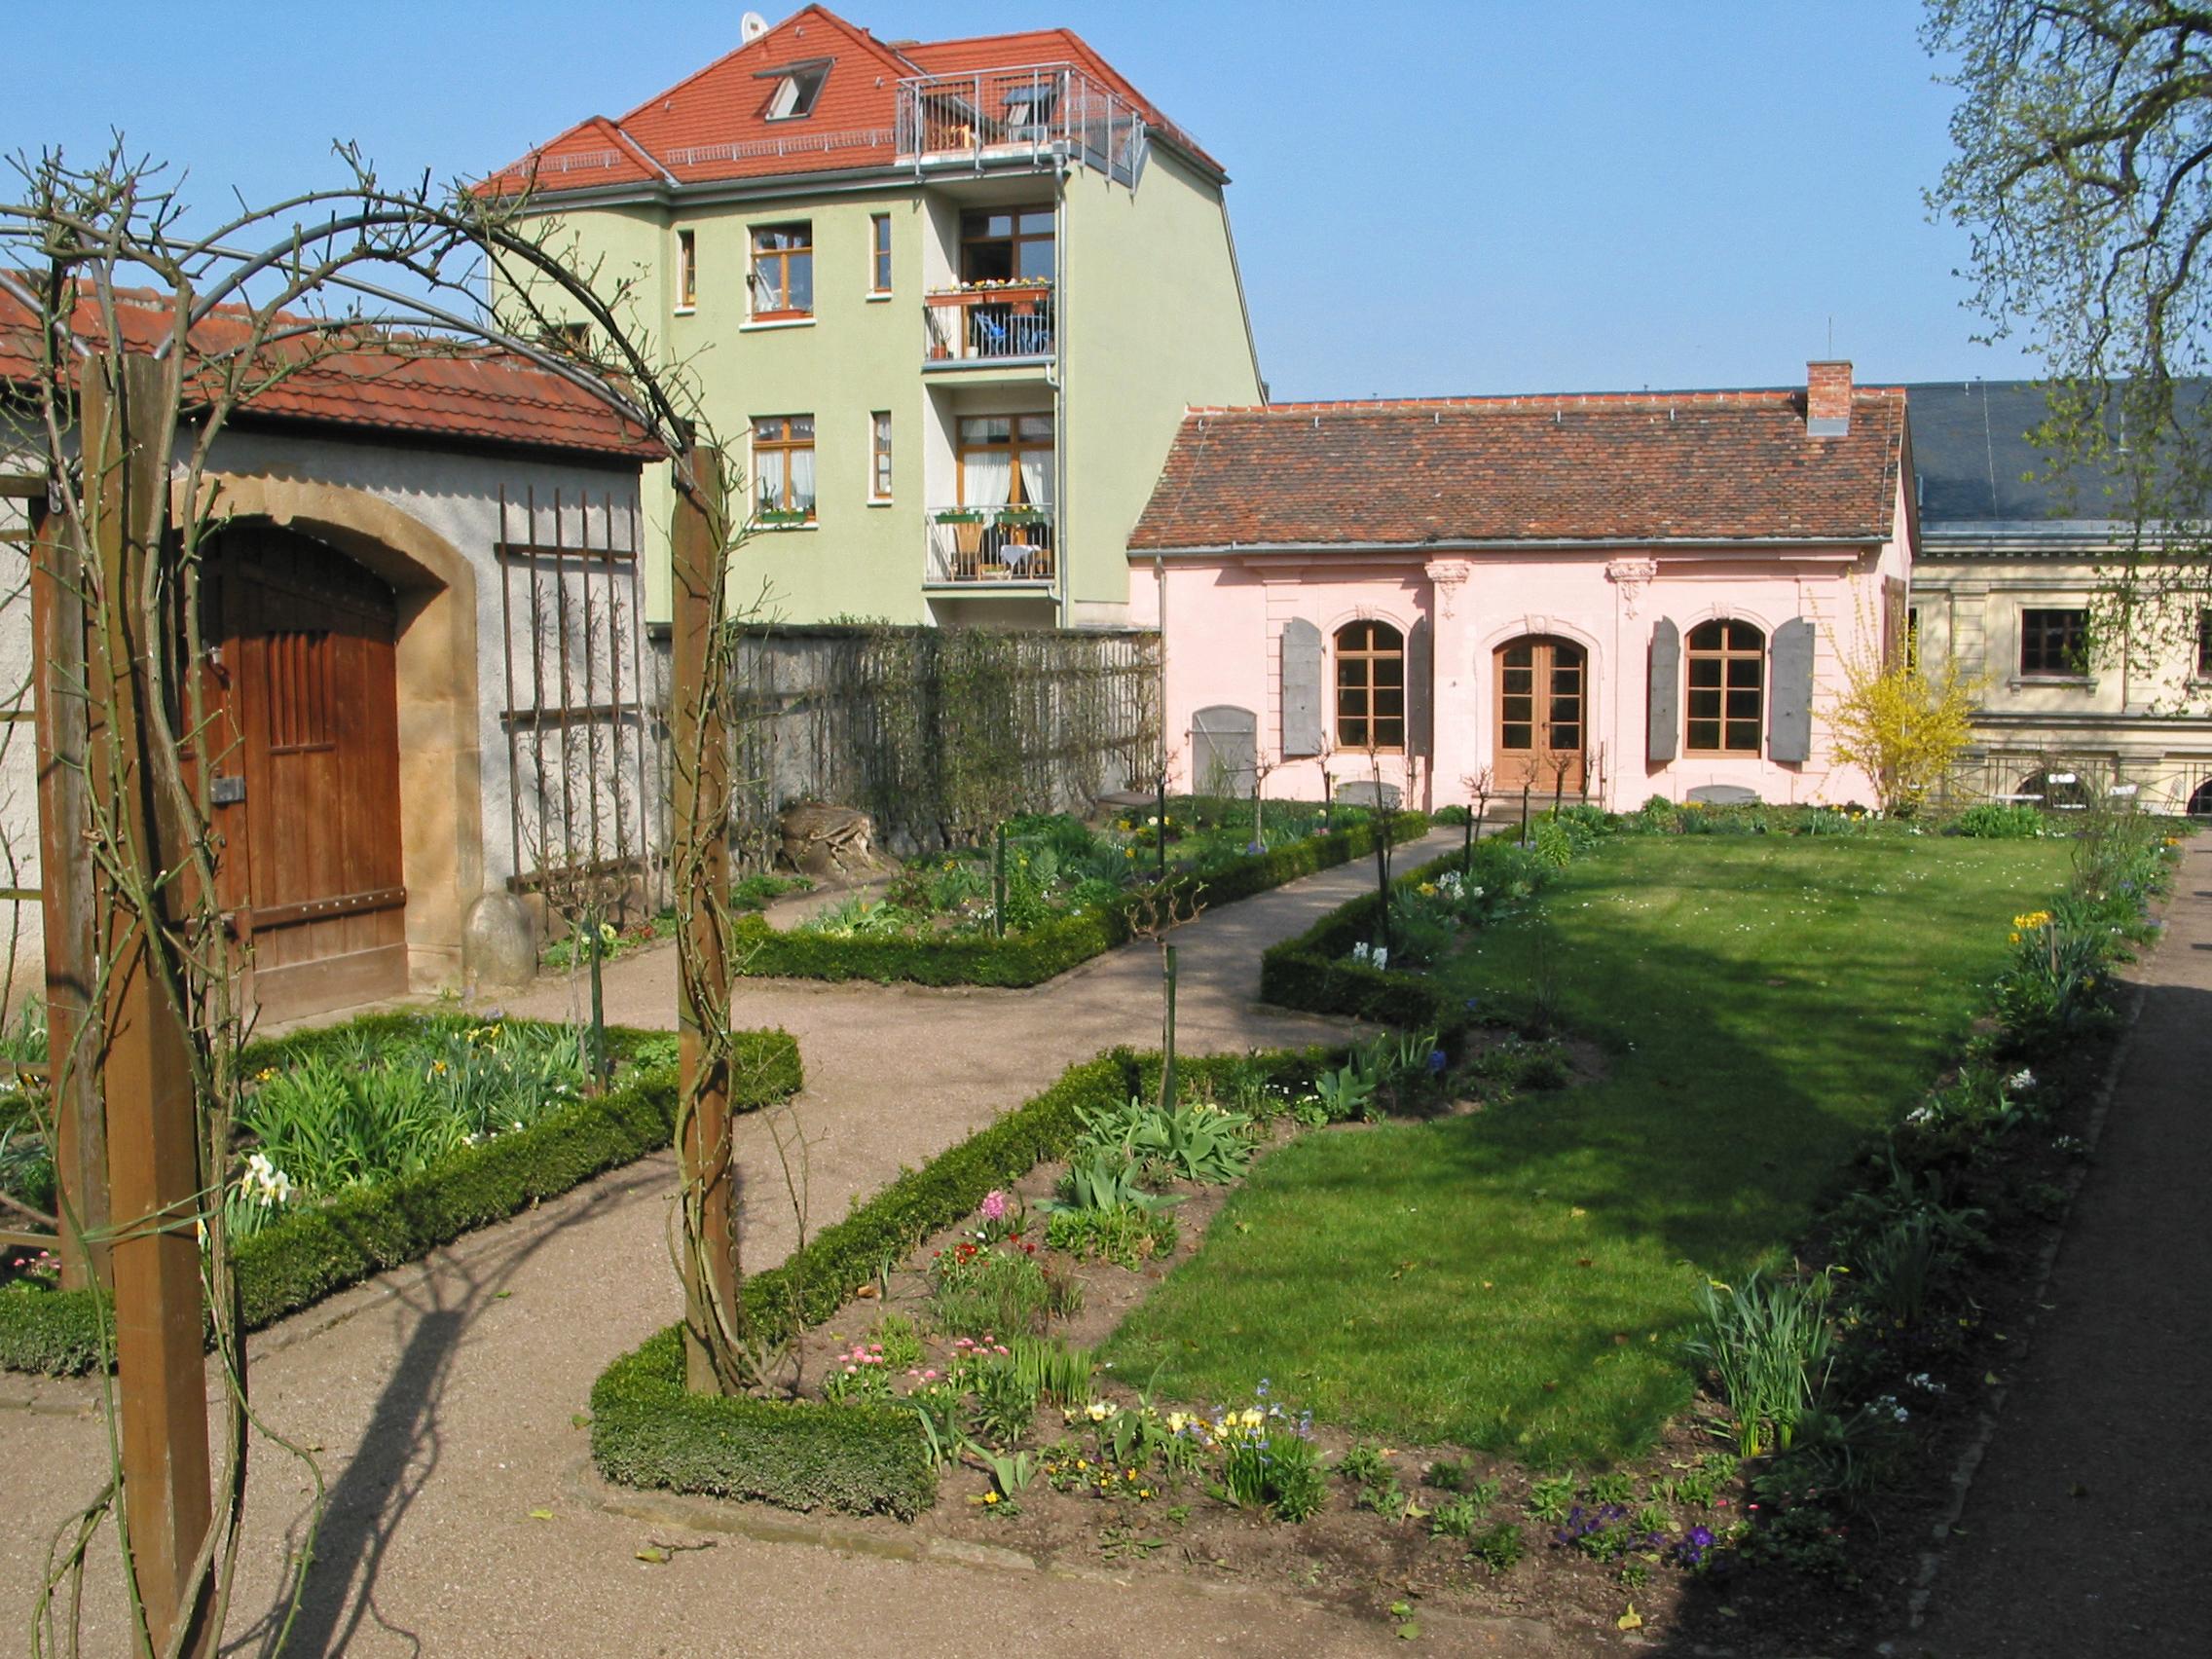 172c789f2dafcd File Kirms-Krackow-Haus11 (Gartenansicht nach Osten).jpg - Wikimedia ...